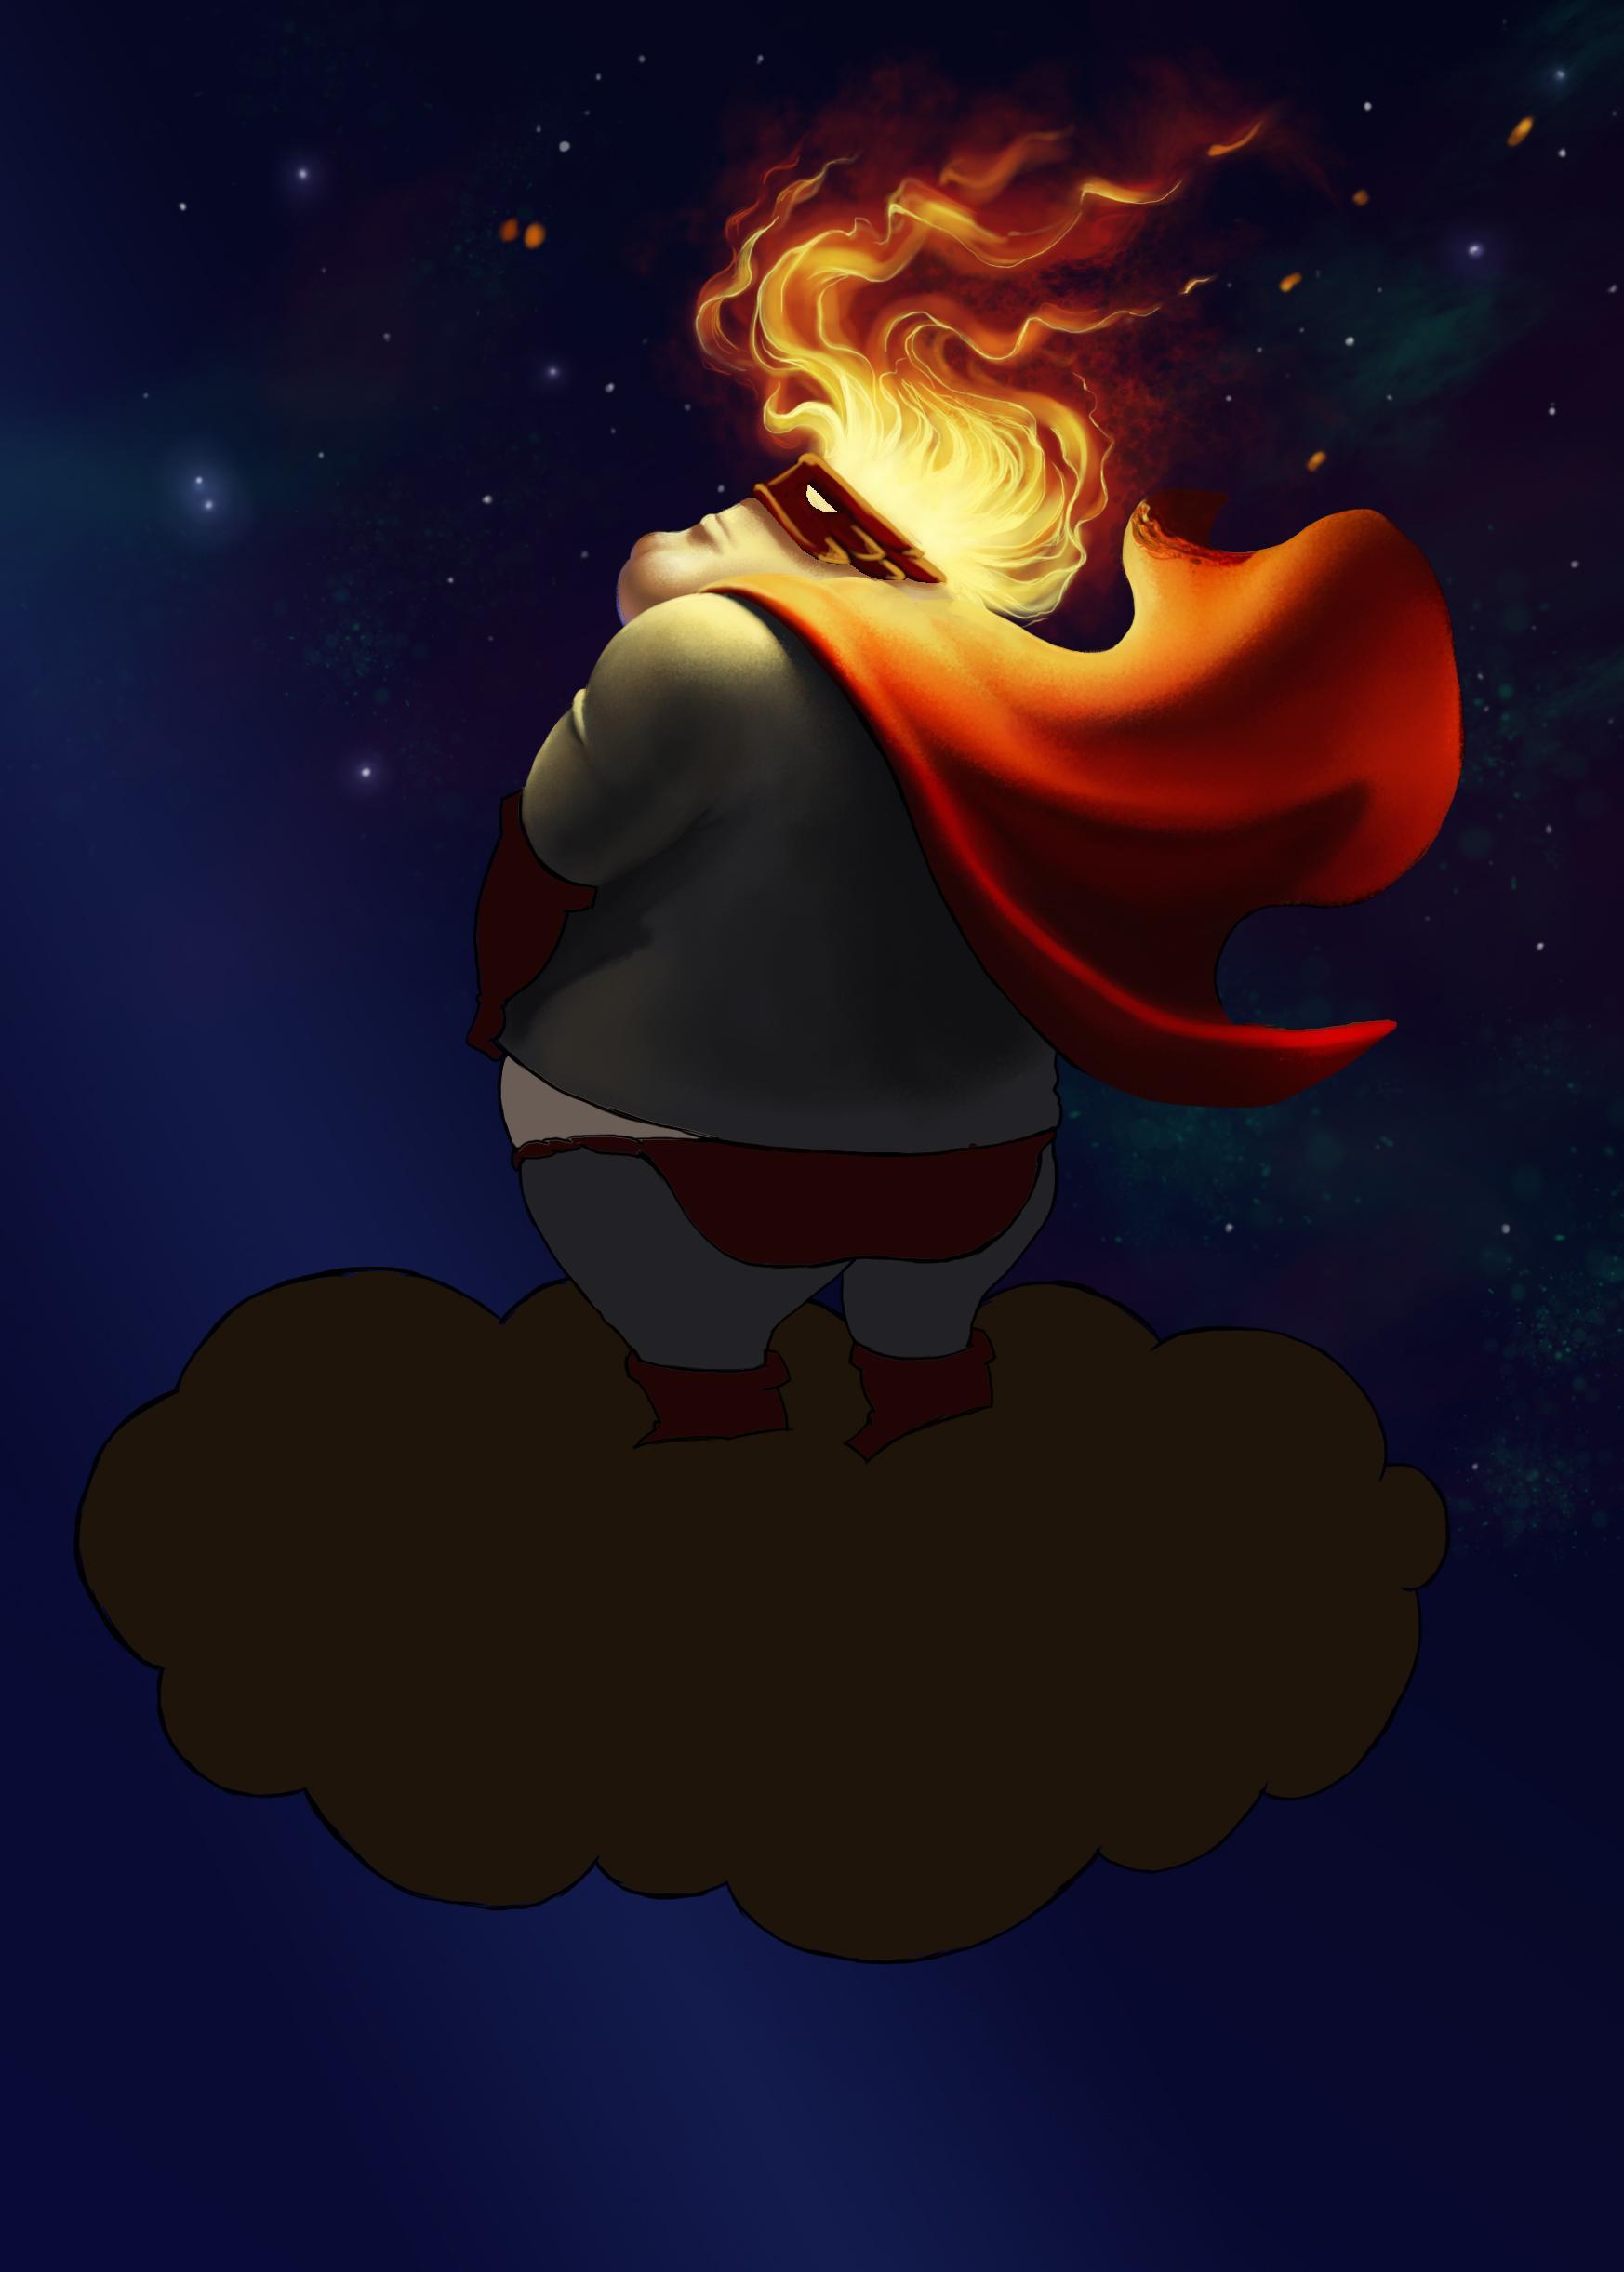 Evil Super hero - image 3 - student project